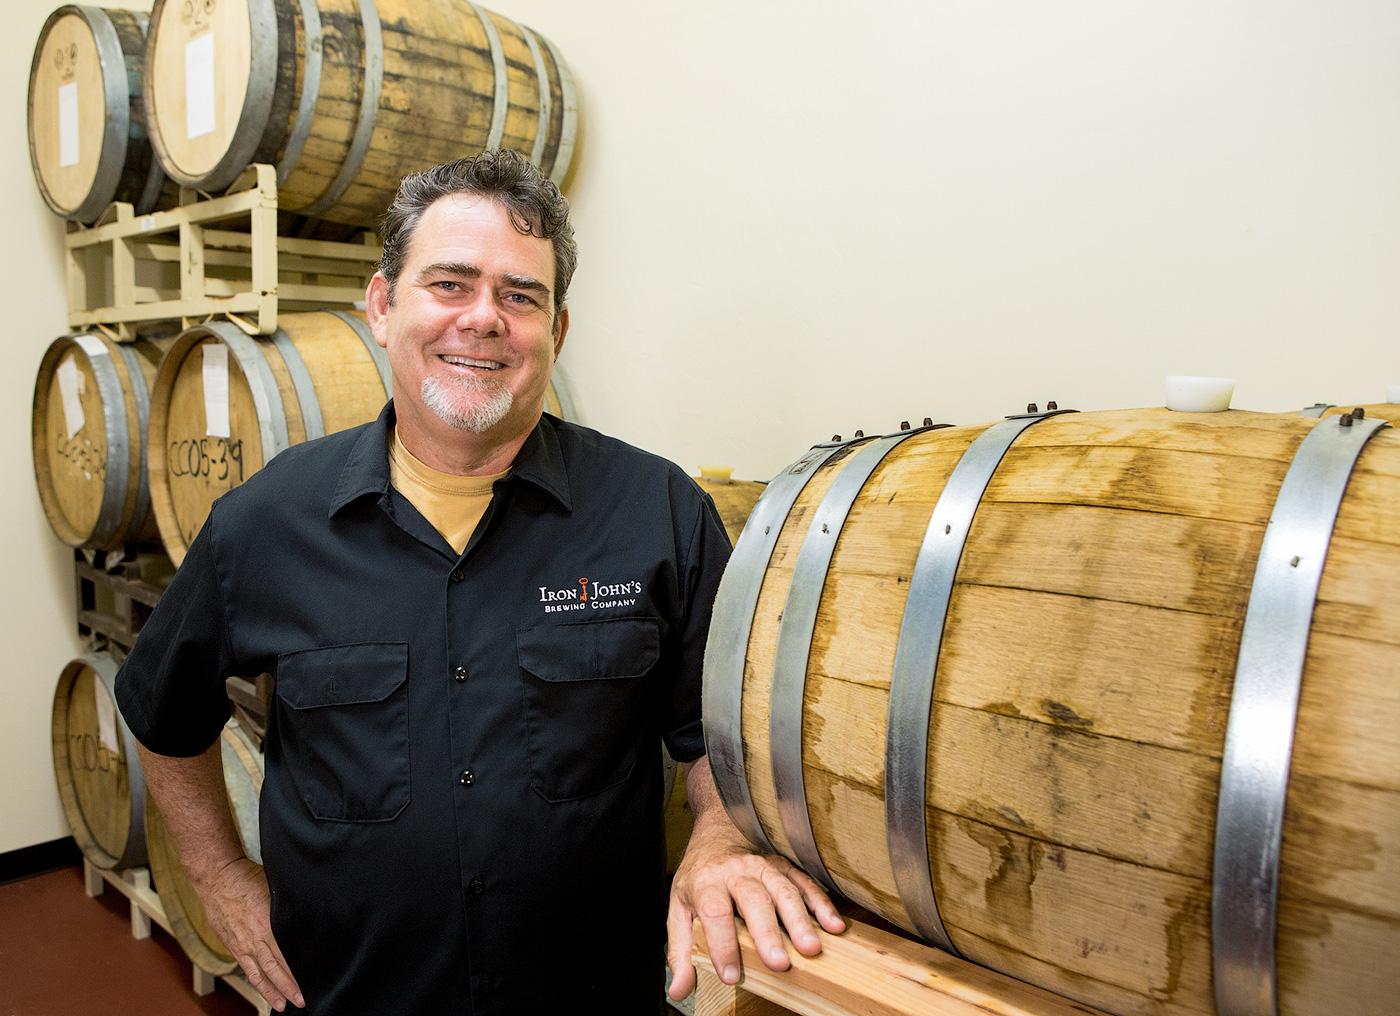 Джон Адкиссон, совладелец пивоварни Iron John's Brewing Company. Фото: Jeff Smith